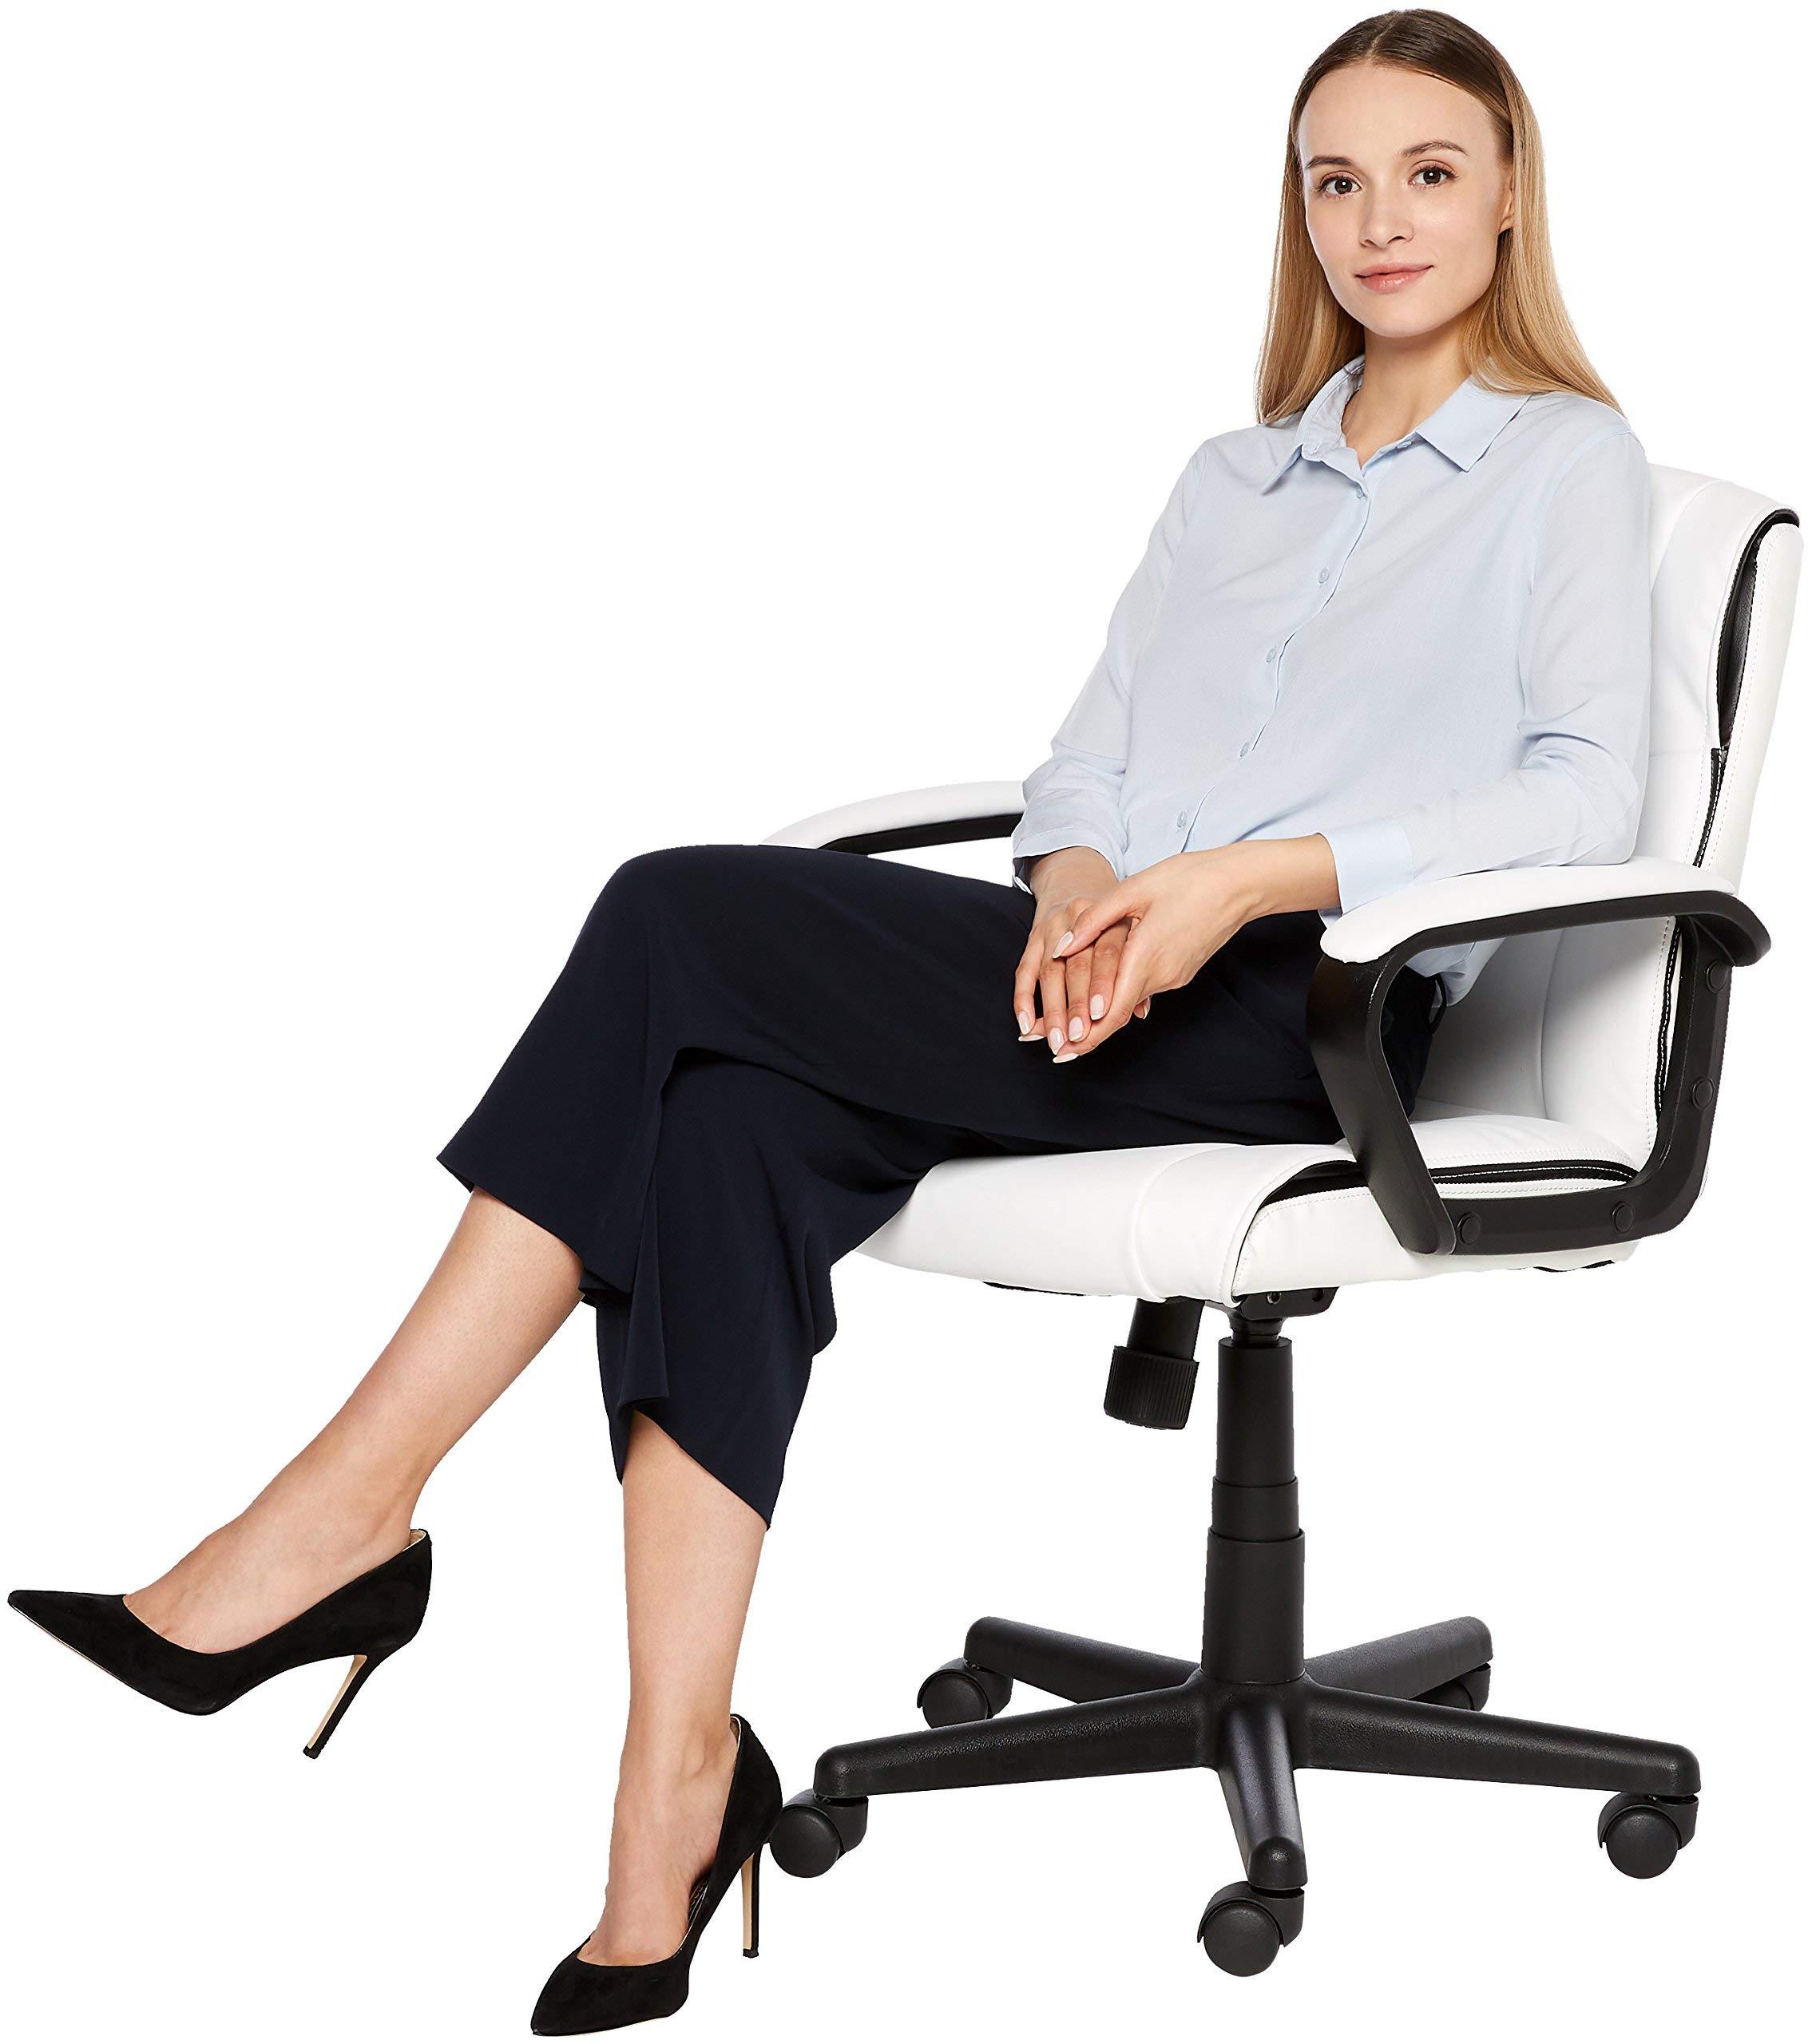 AmazonBasics Classic Leather-Padded Mid-Back Office Chair with Armrest - White by AmazonBasics (Image #8)